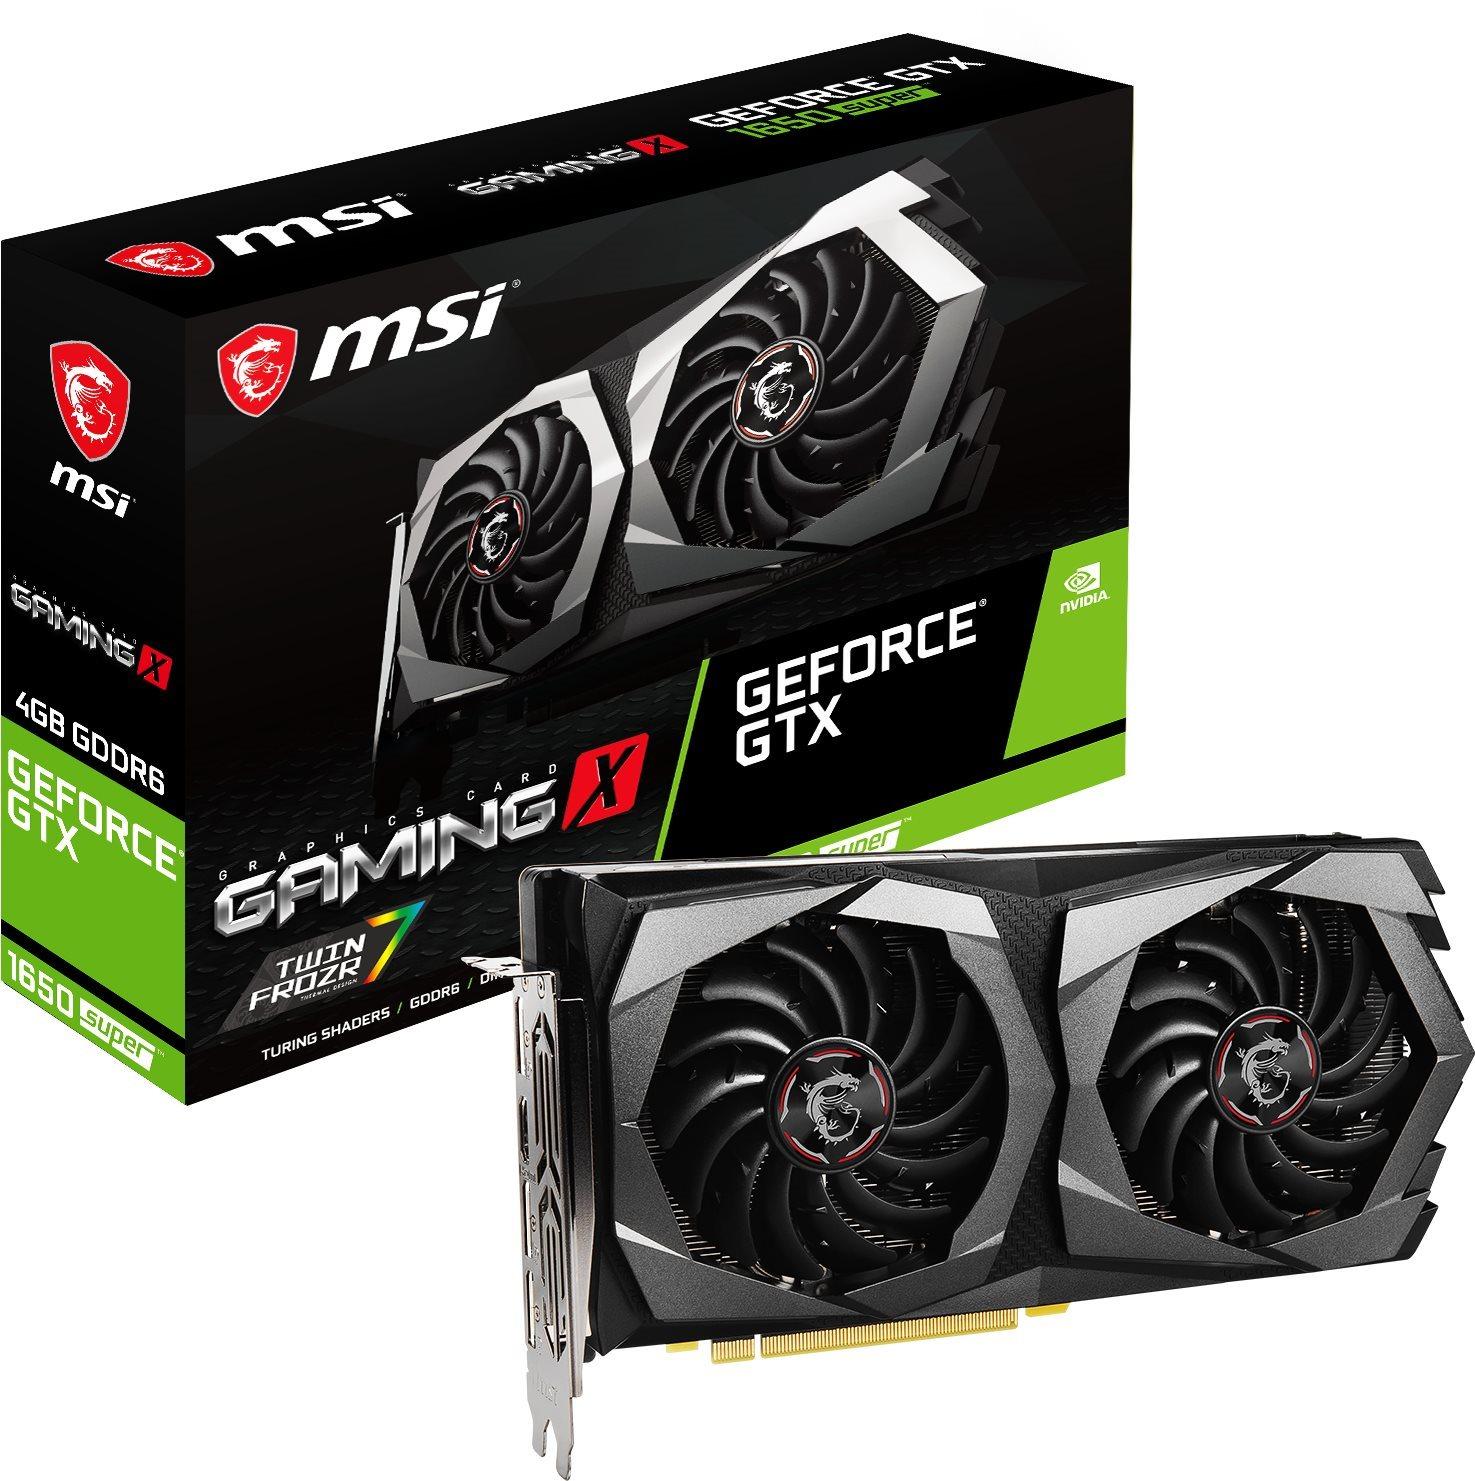 MSI GeForce GTX 1650 SUPER GAMING X 4G